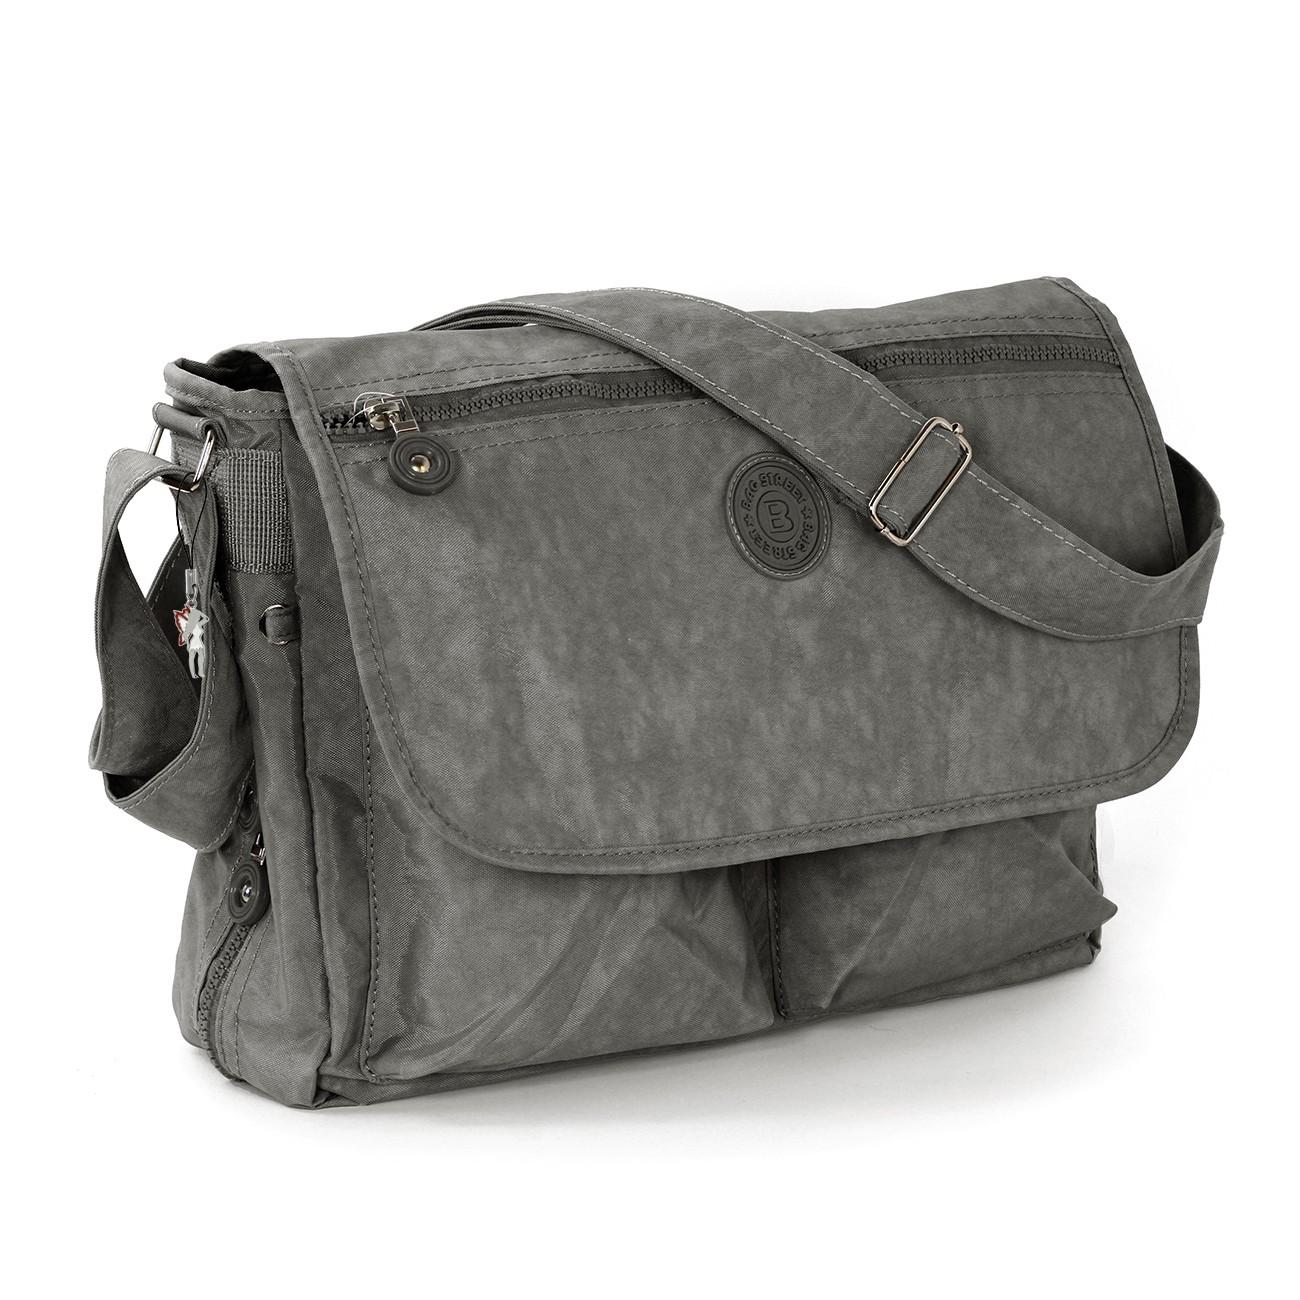 Schultertasche Nylon grau Cross-Body Umhängetasche Bag Street OTJ203K